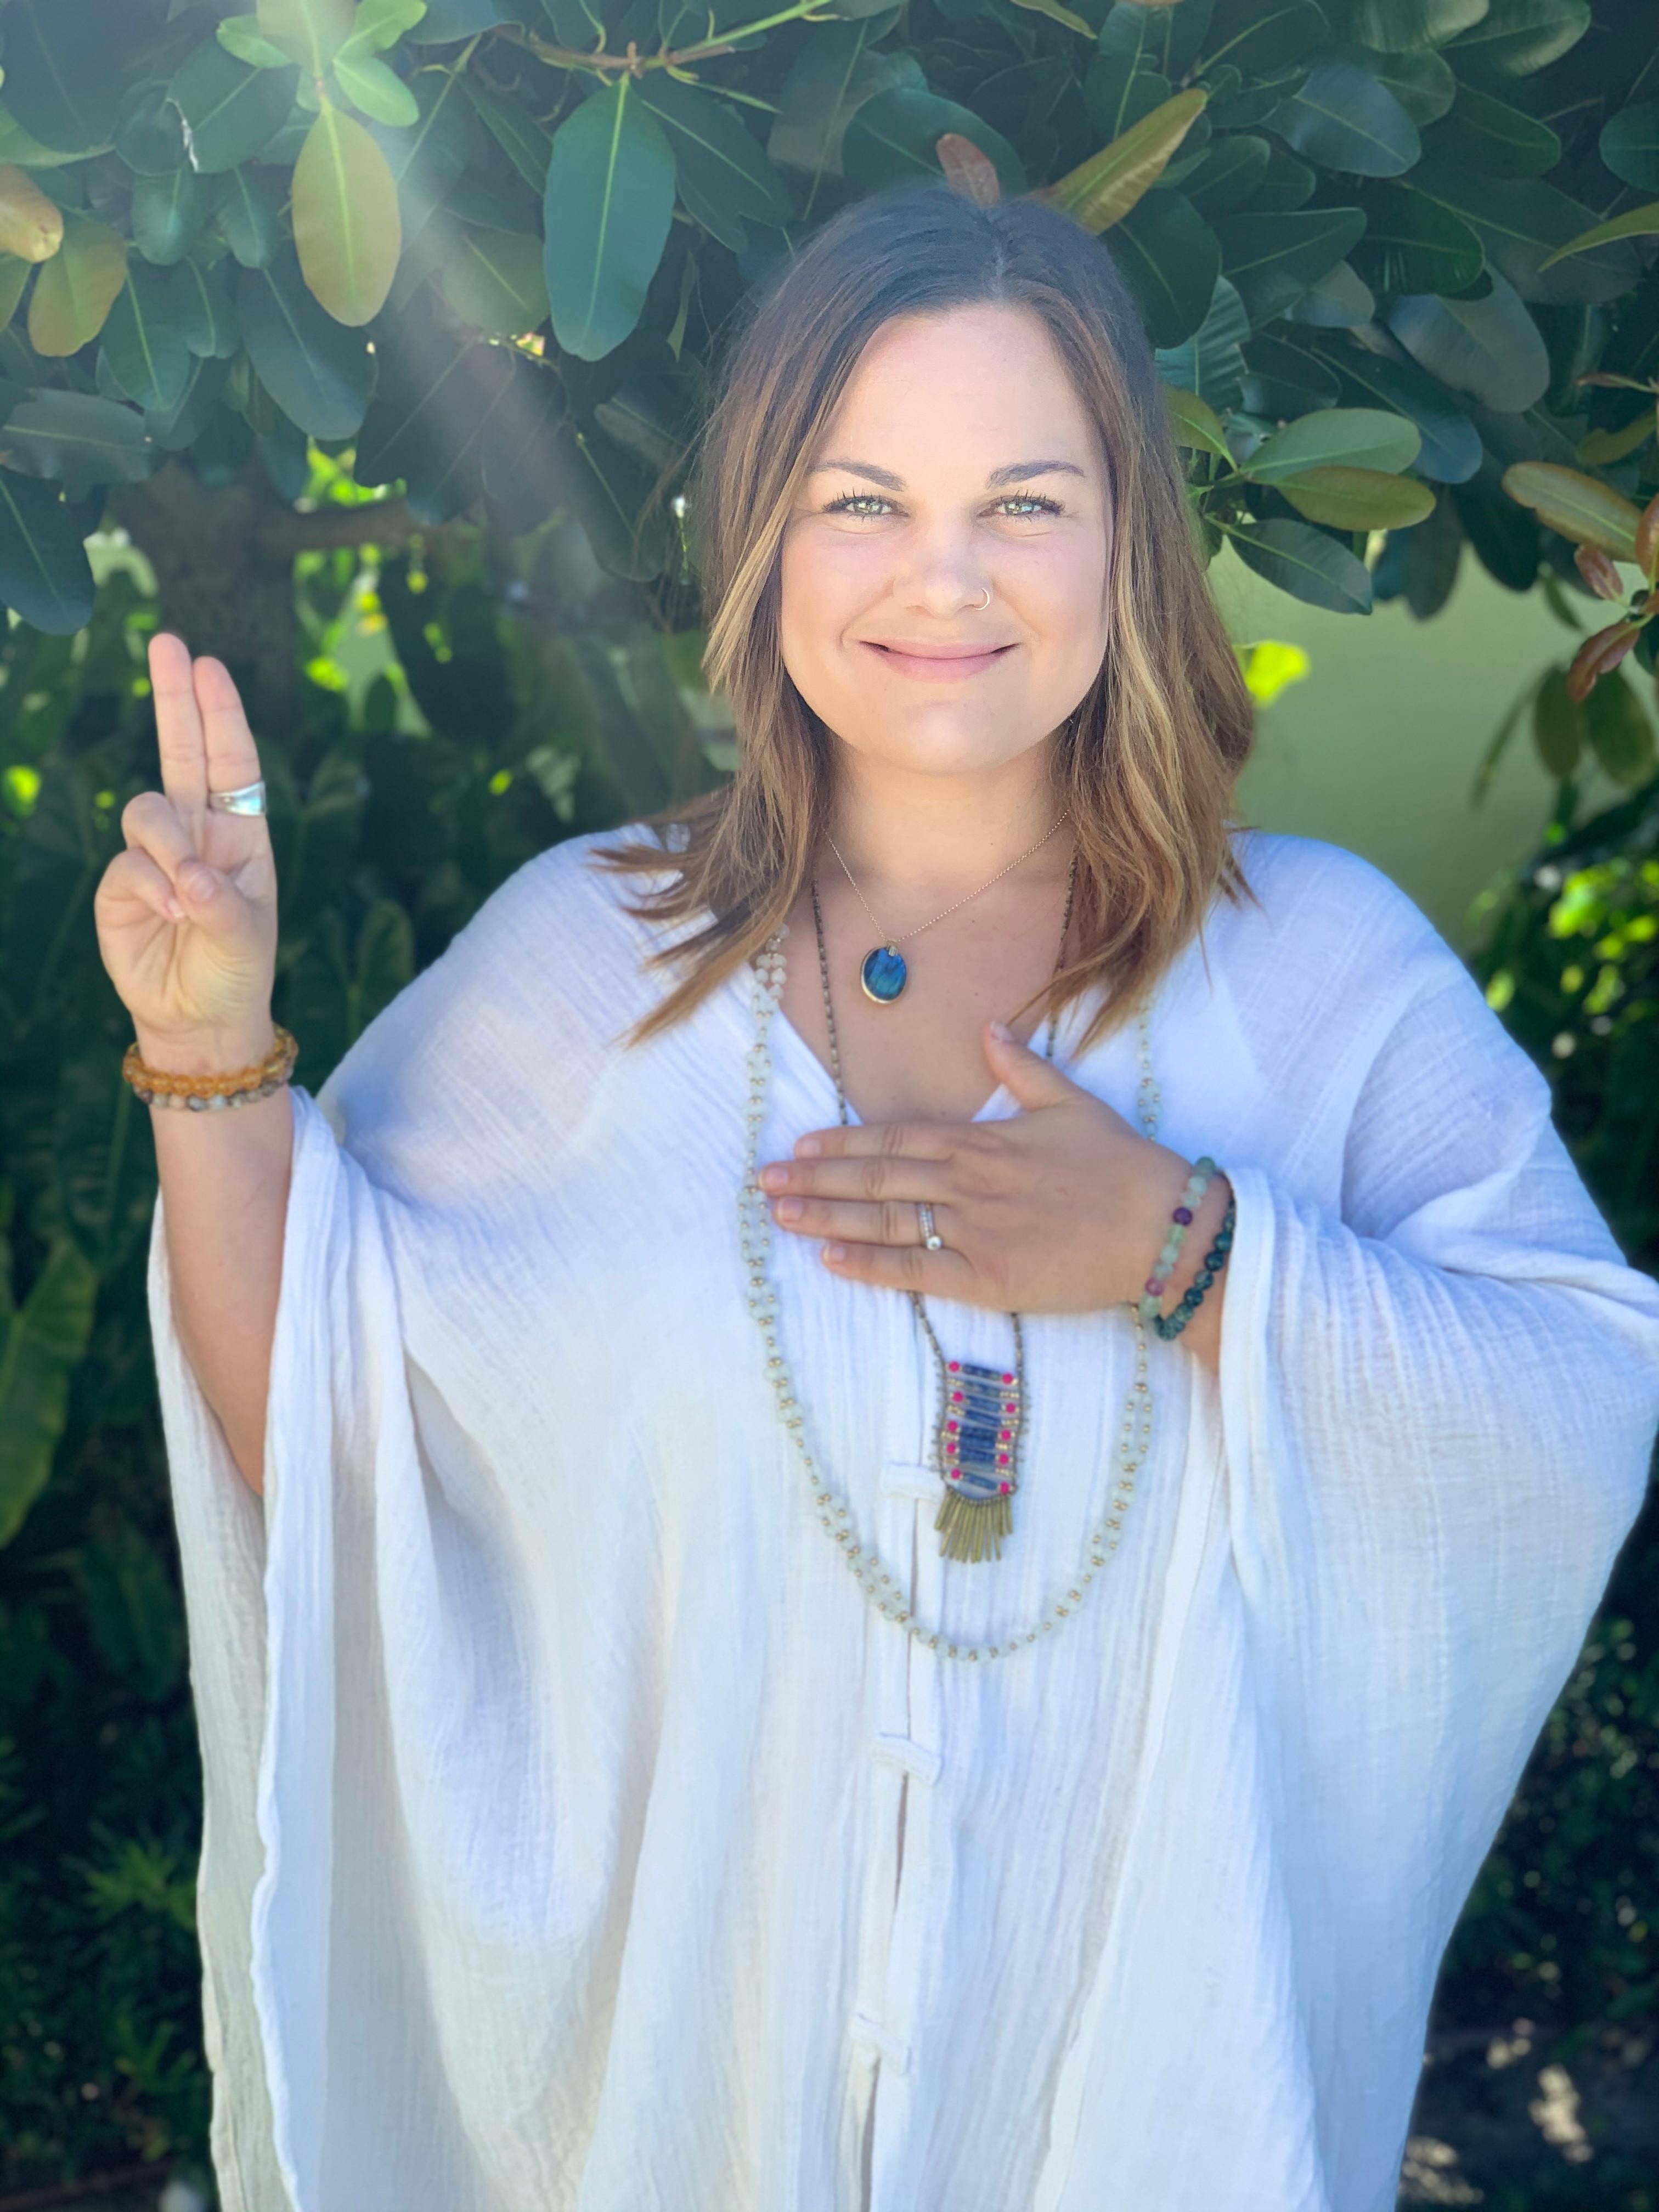 Thurs 6pm CT Kundalini Yoga + Meditation